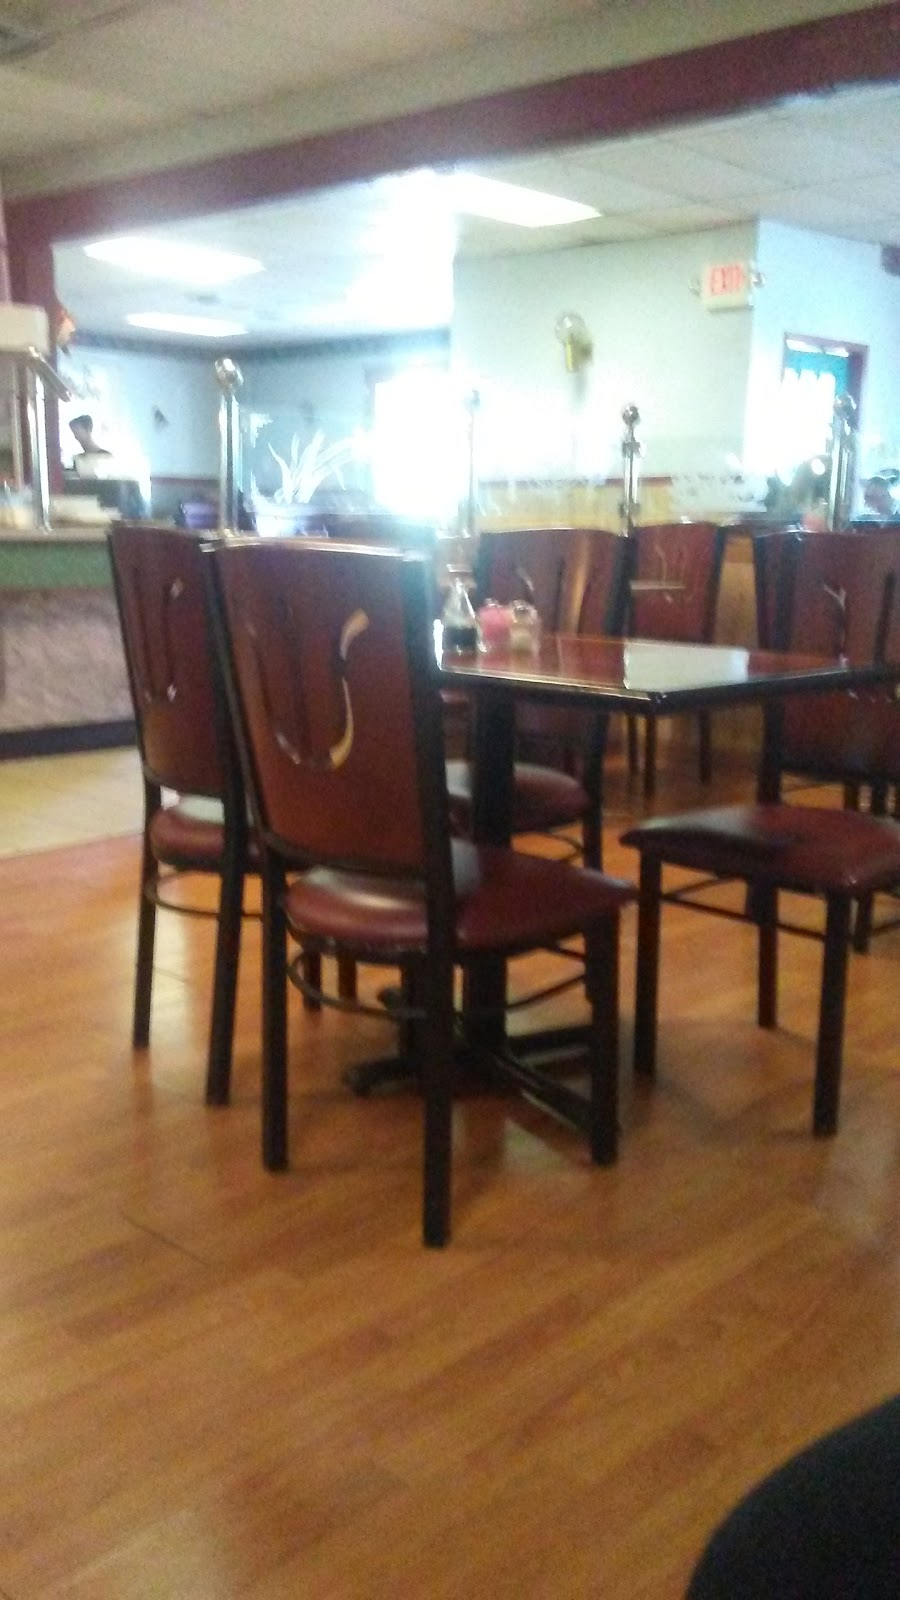 China Wok   restaurant   1620 Main St, Clifton Forge, VA 24422, USA   5408627788 OR +1 540-862-7788